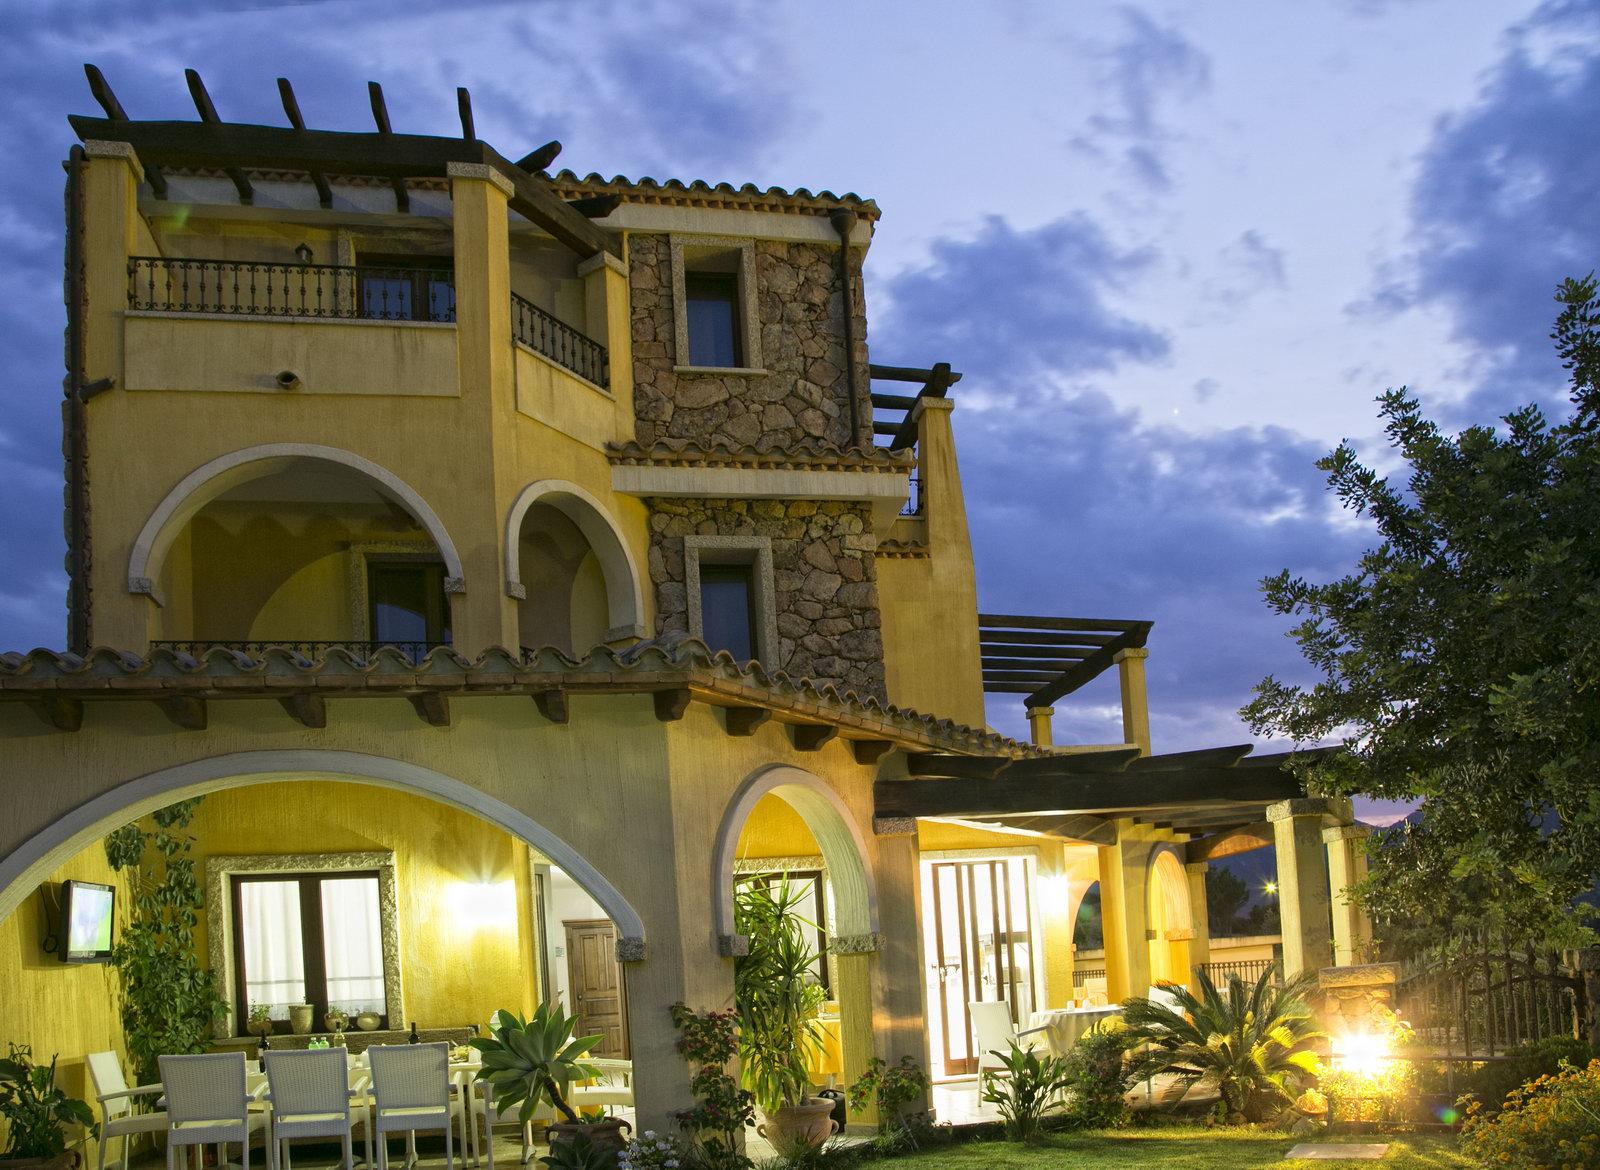 Hotel villasimius sa suergia hotel villasimius sardegna for 3 stelle arreda beinasco